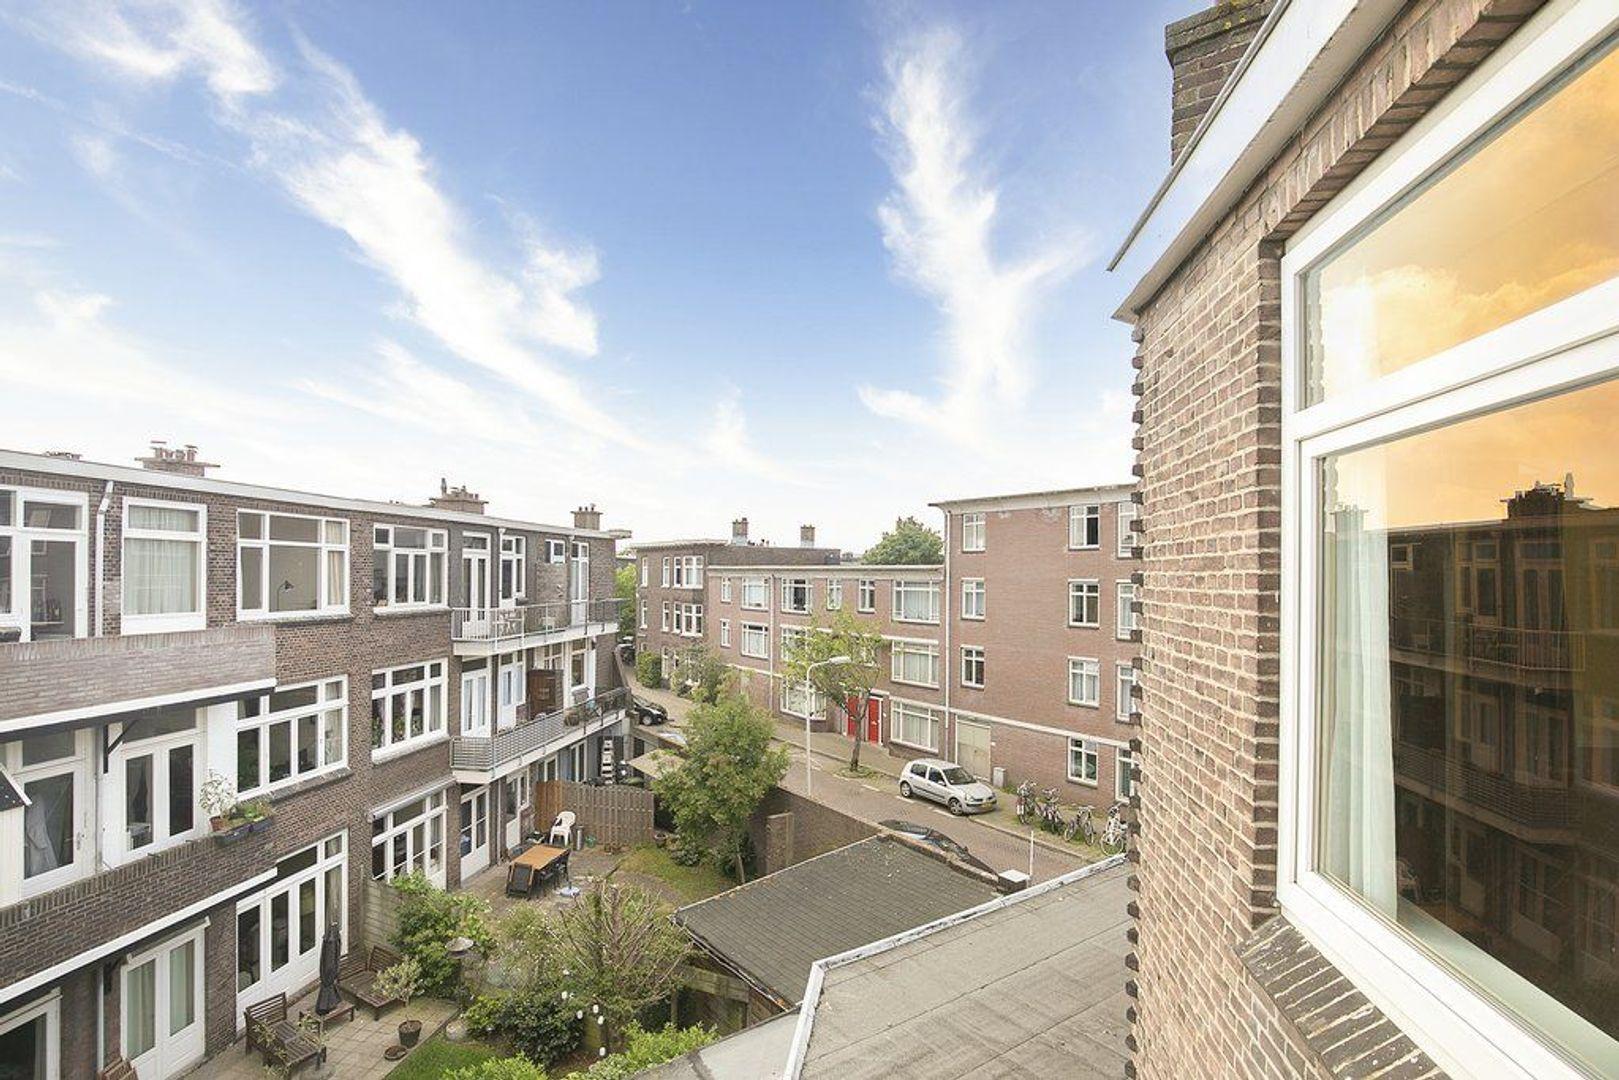 3e Joan Maetsuyckerstraat 228, Den Haag foto-14